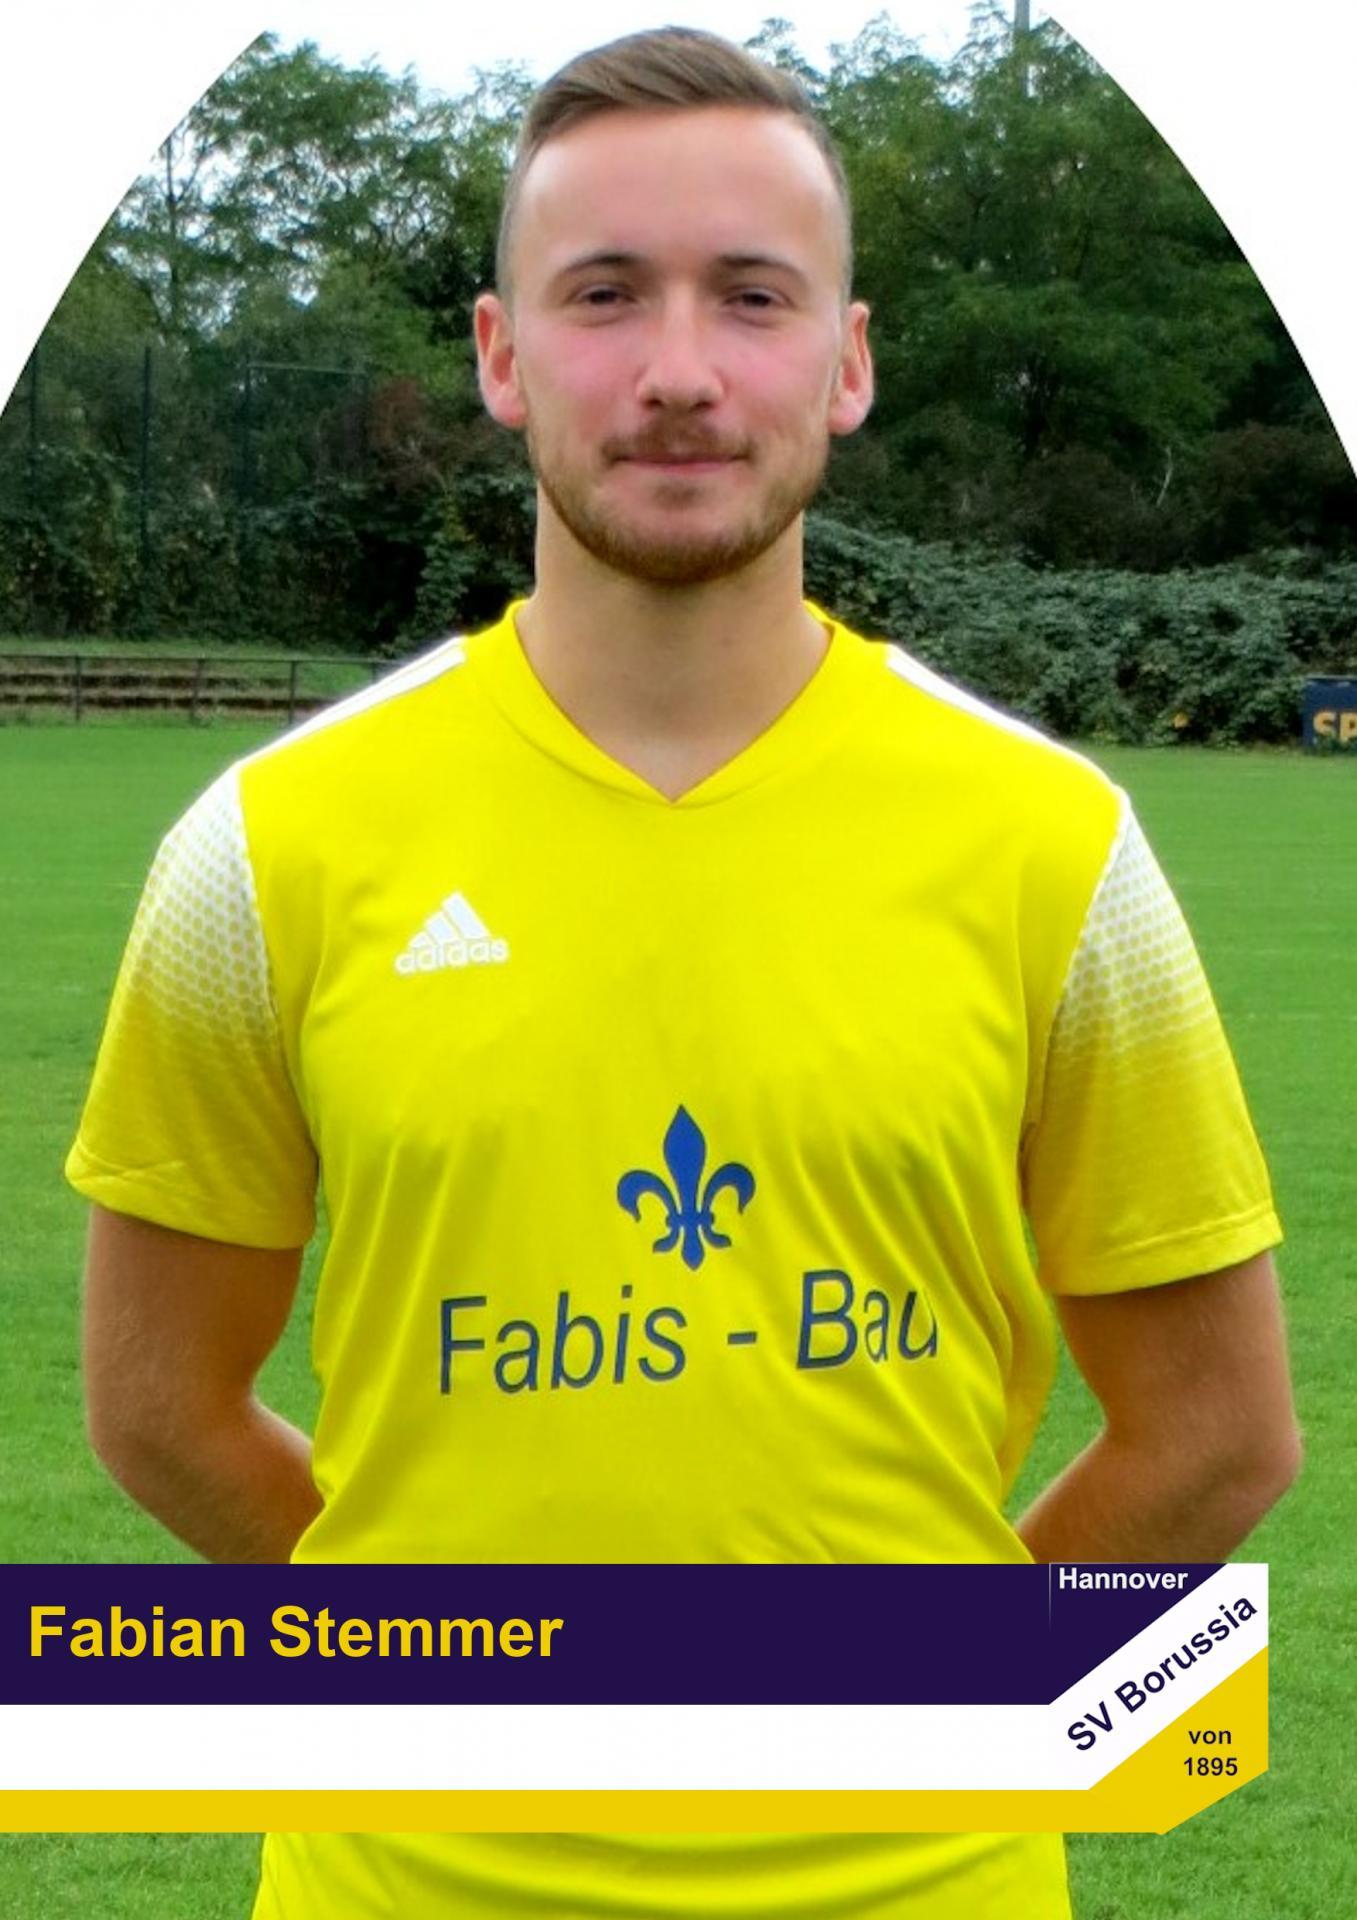 Fabian Stemmer